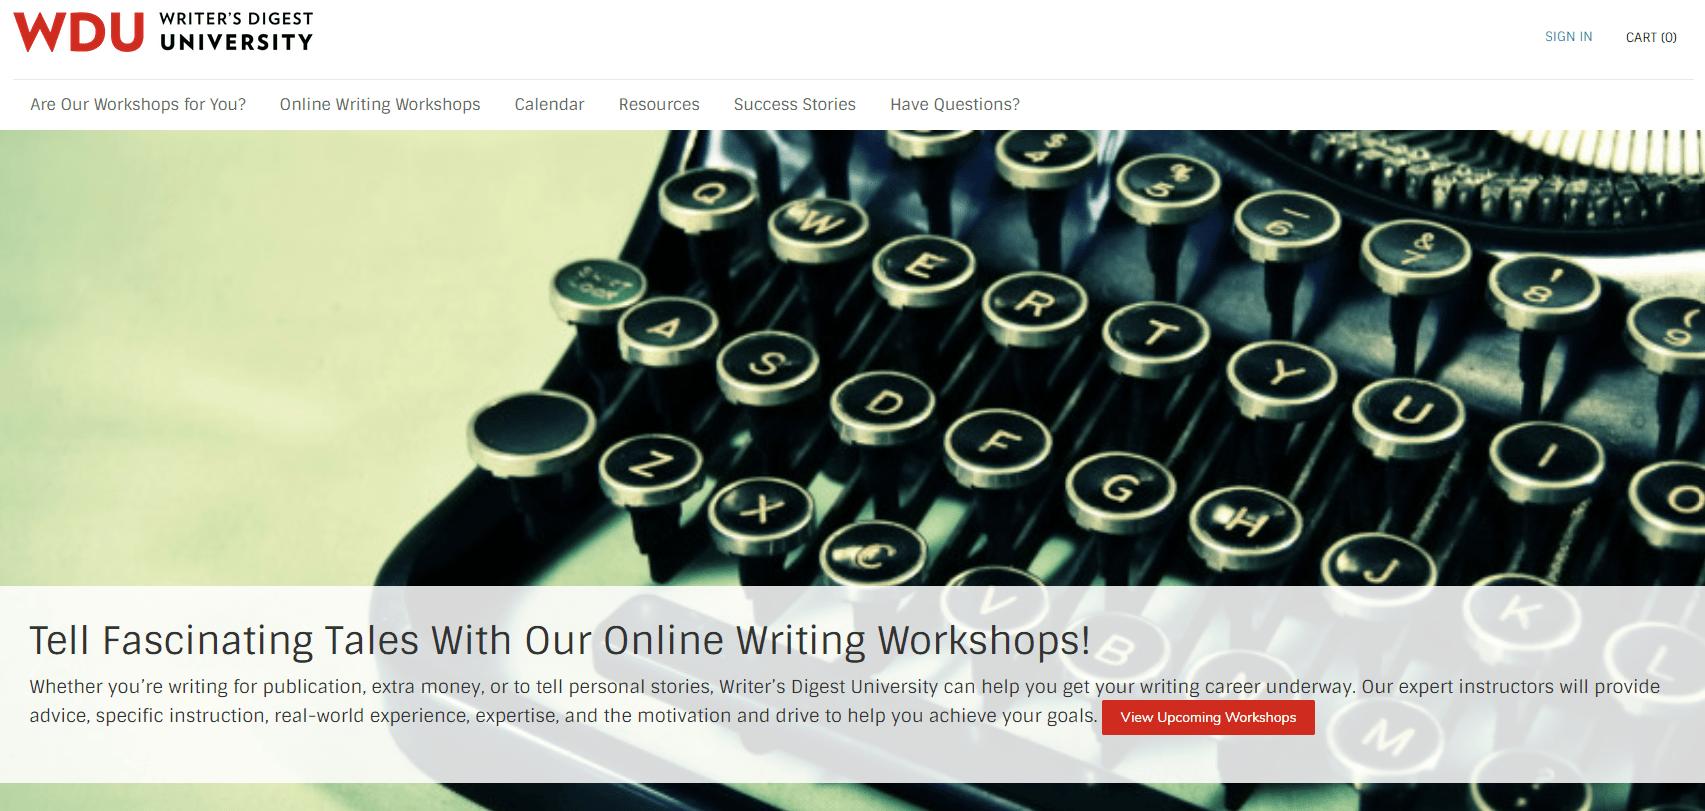 Writers Digest University Home Page screenshot